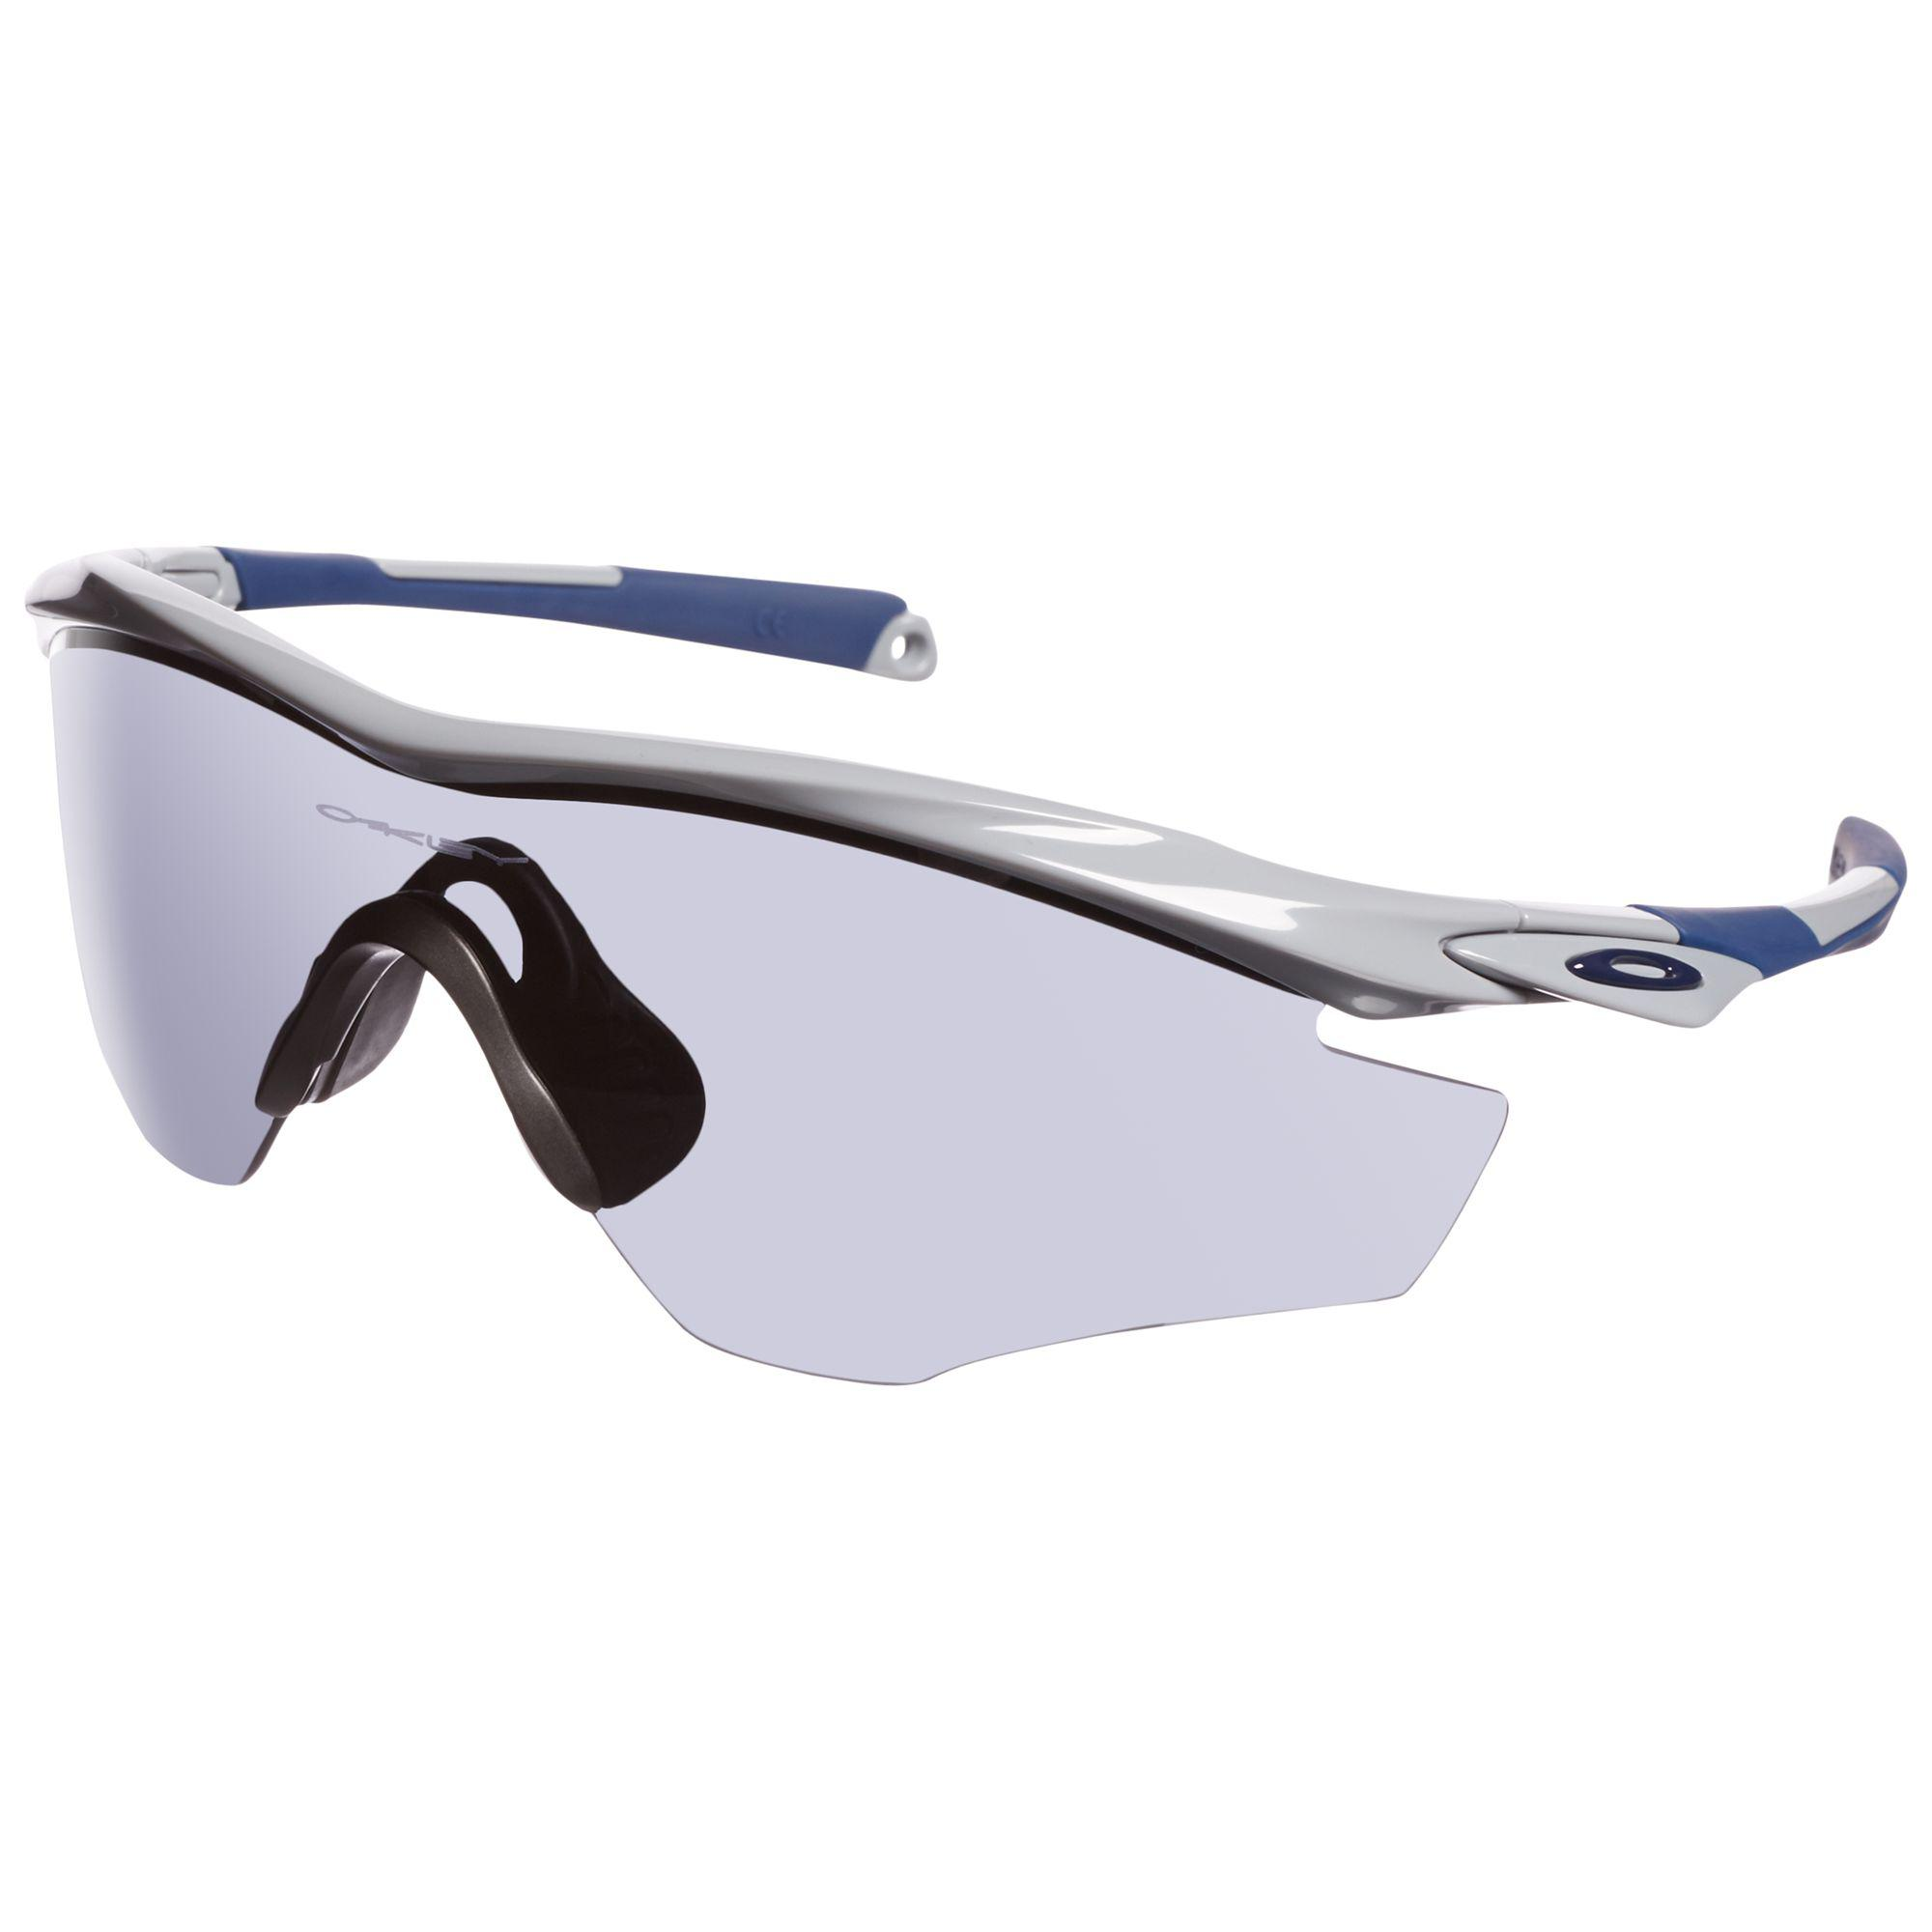 59f594b68d01b For Sunglasses Frame Oo9212 Oakley Lyst Men M2 wpf8xU